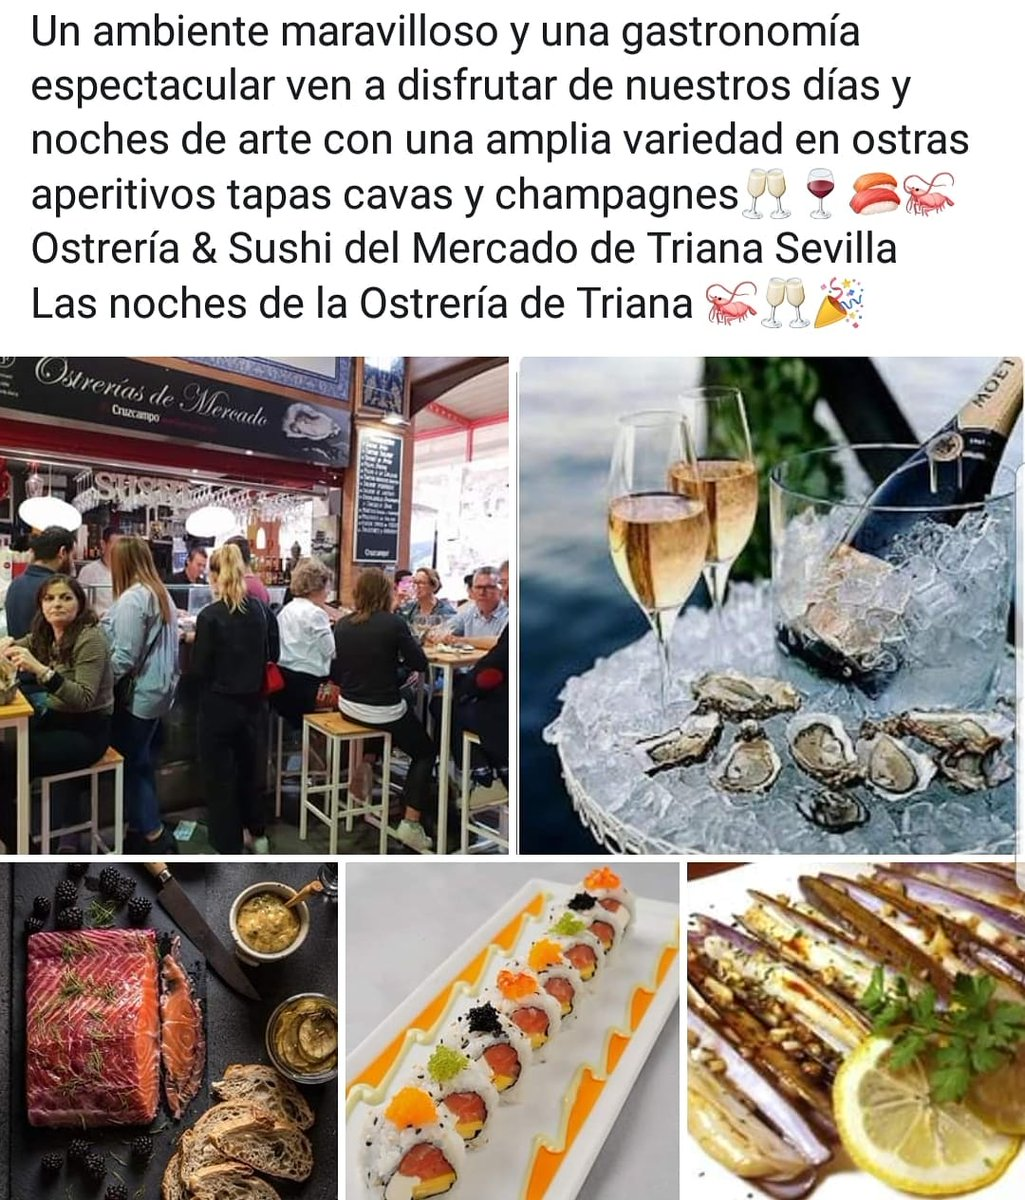 OSTRERIAS de mercado, ubicados dentro del mercado de abastos de Triana Sevilla.  #sevillarestaurant #sevillagram #sevillanas #sevillarestaurant #oysters #oyter #hosteleria #huitres #oysters #ostras #gillardeau #sushi #comerentriana #champagne #catering #boda #foodsevillapic.twitter.com/HoNZCpV6nT